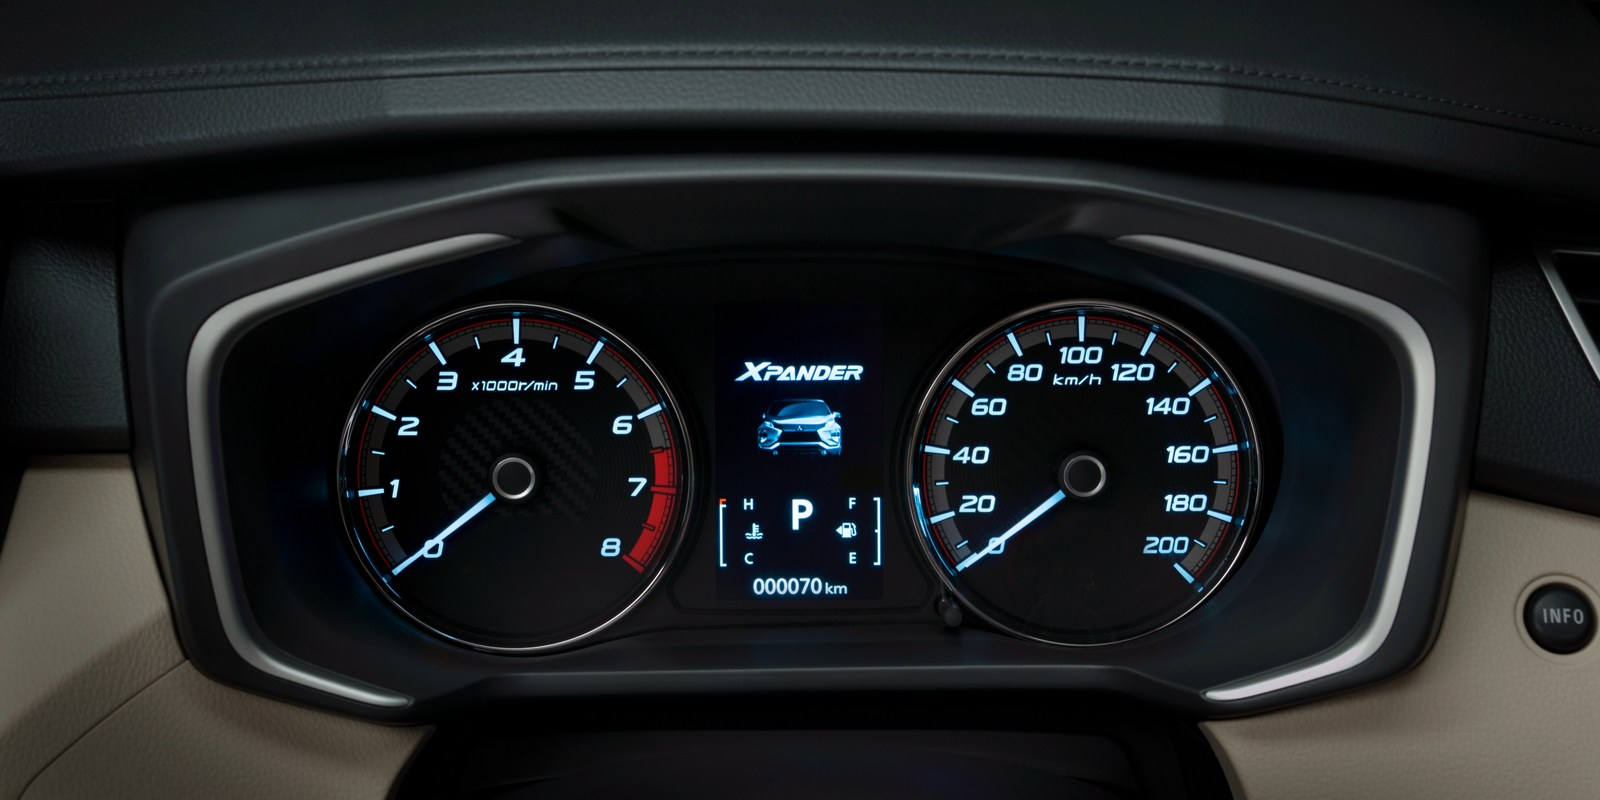 2019 Mitsubishi L200 (Triton) Facelift Flaunts Dynamic ...